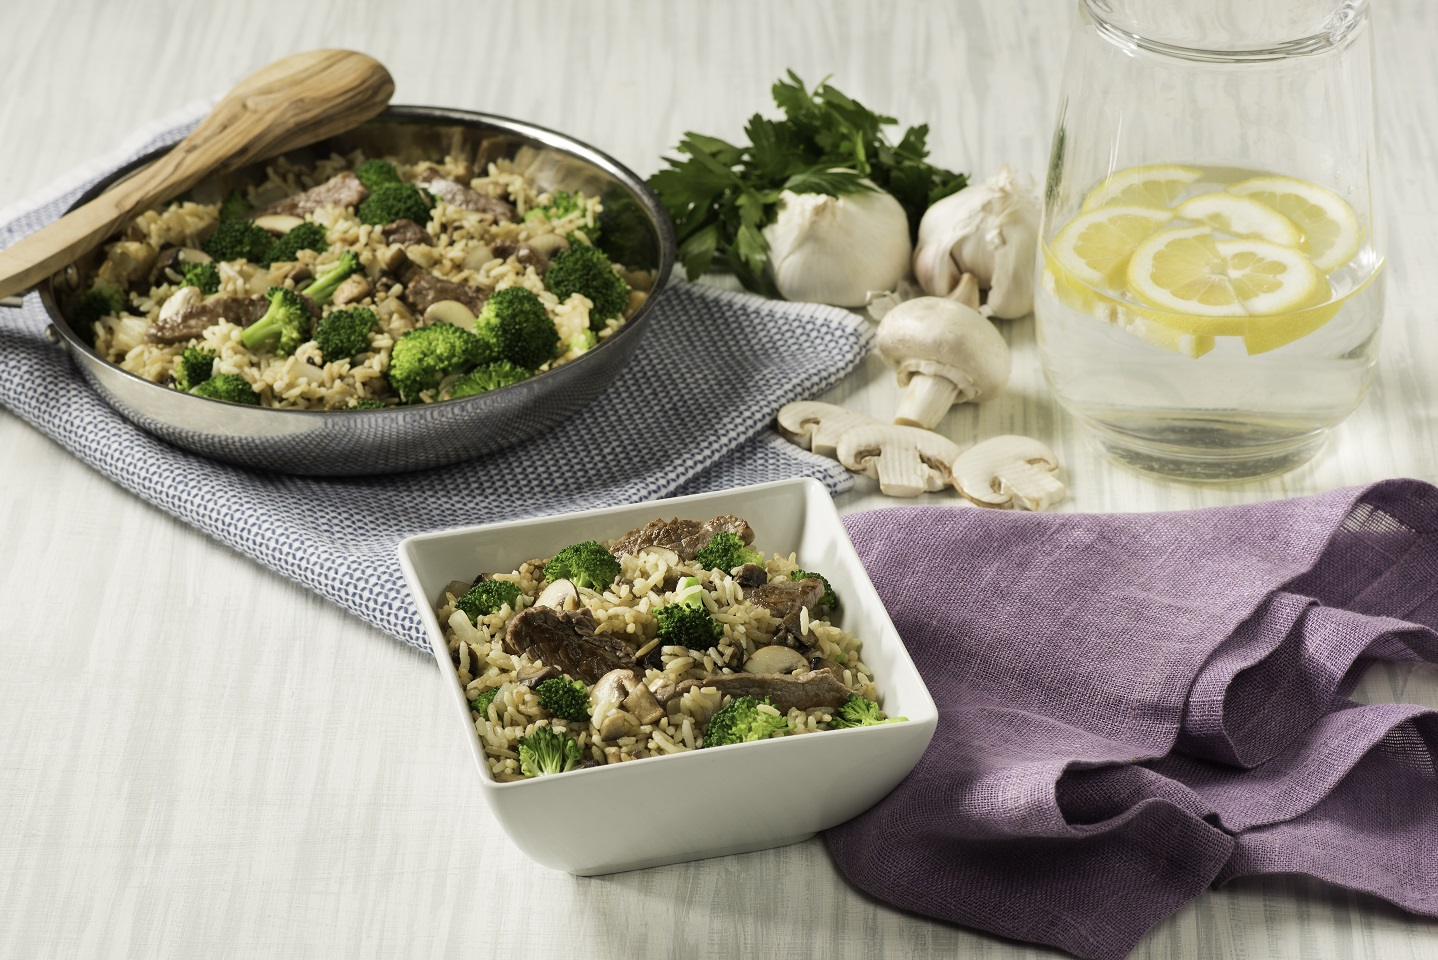 Savory Beef & Broccoli Rice